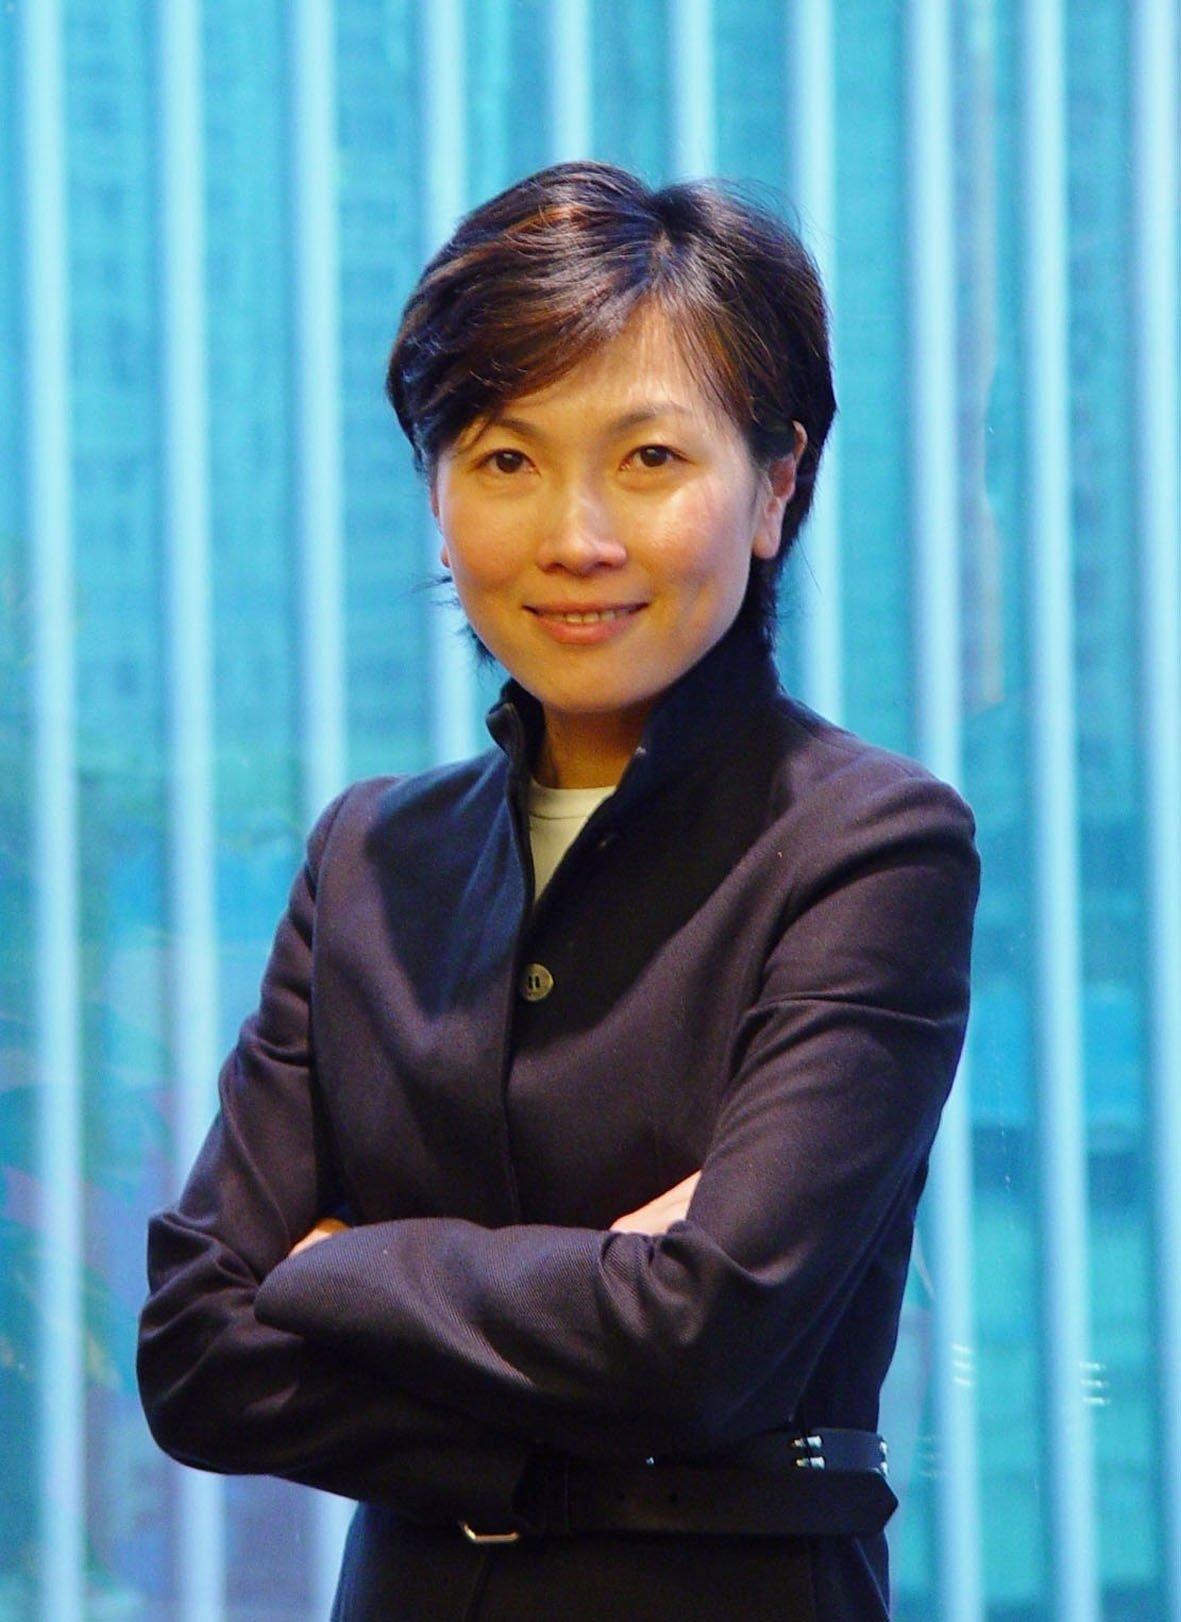 Samantha Ho-invesco.JPG